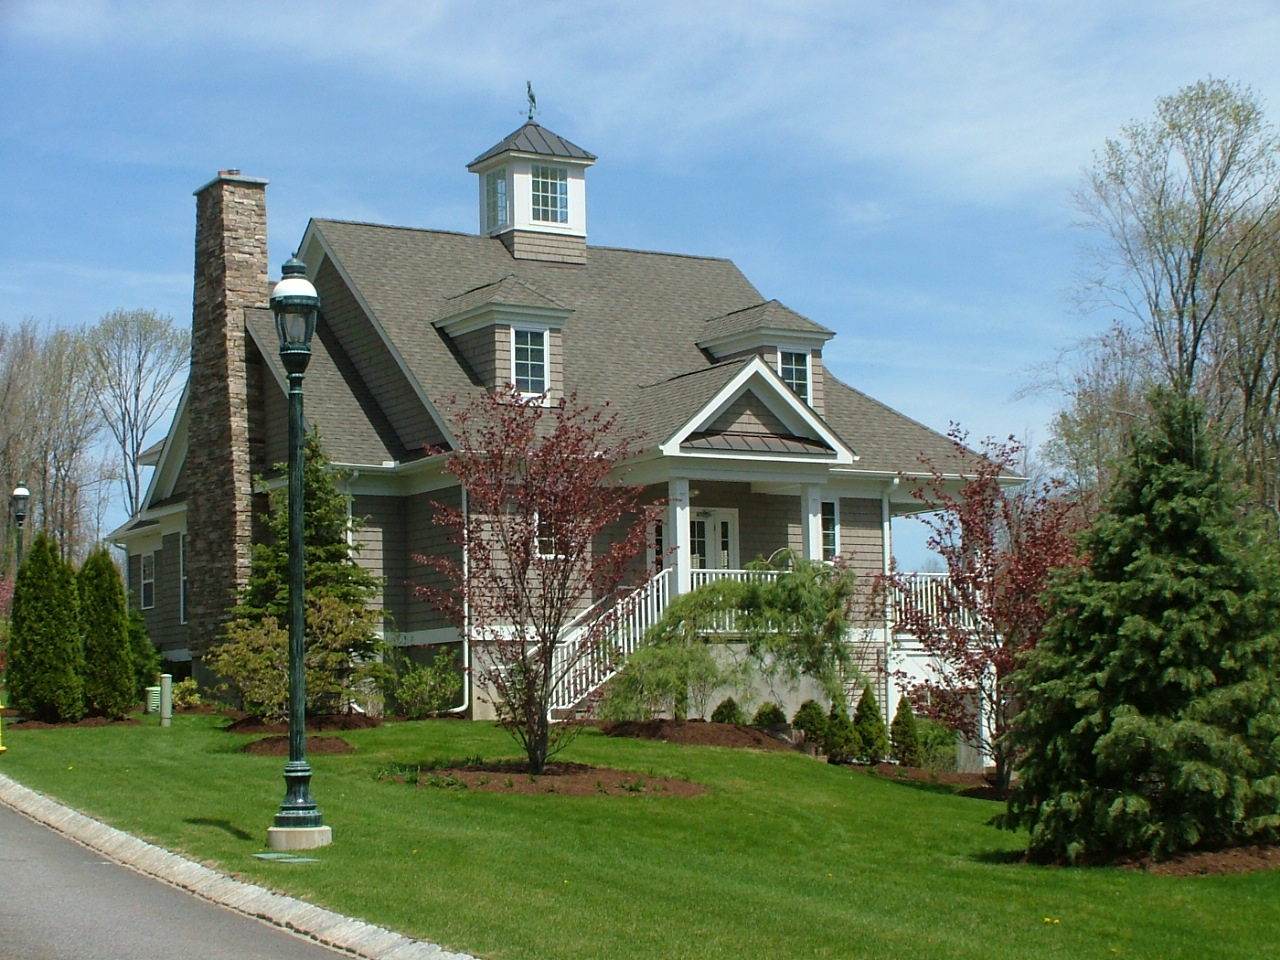 Harbourside Home Design & Construction Services